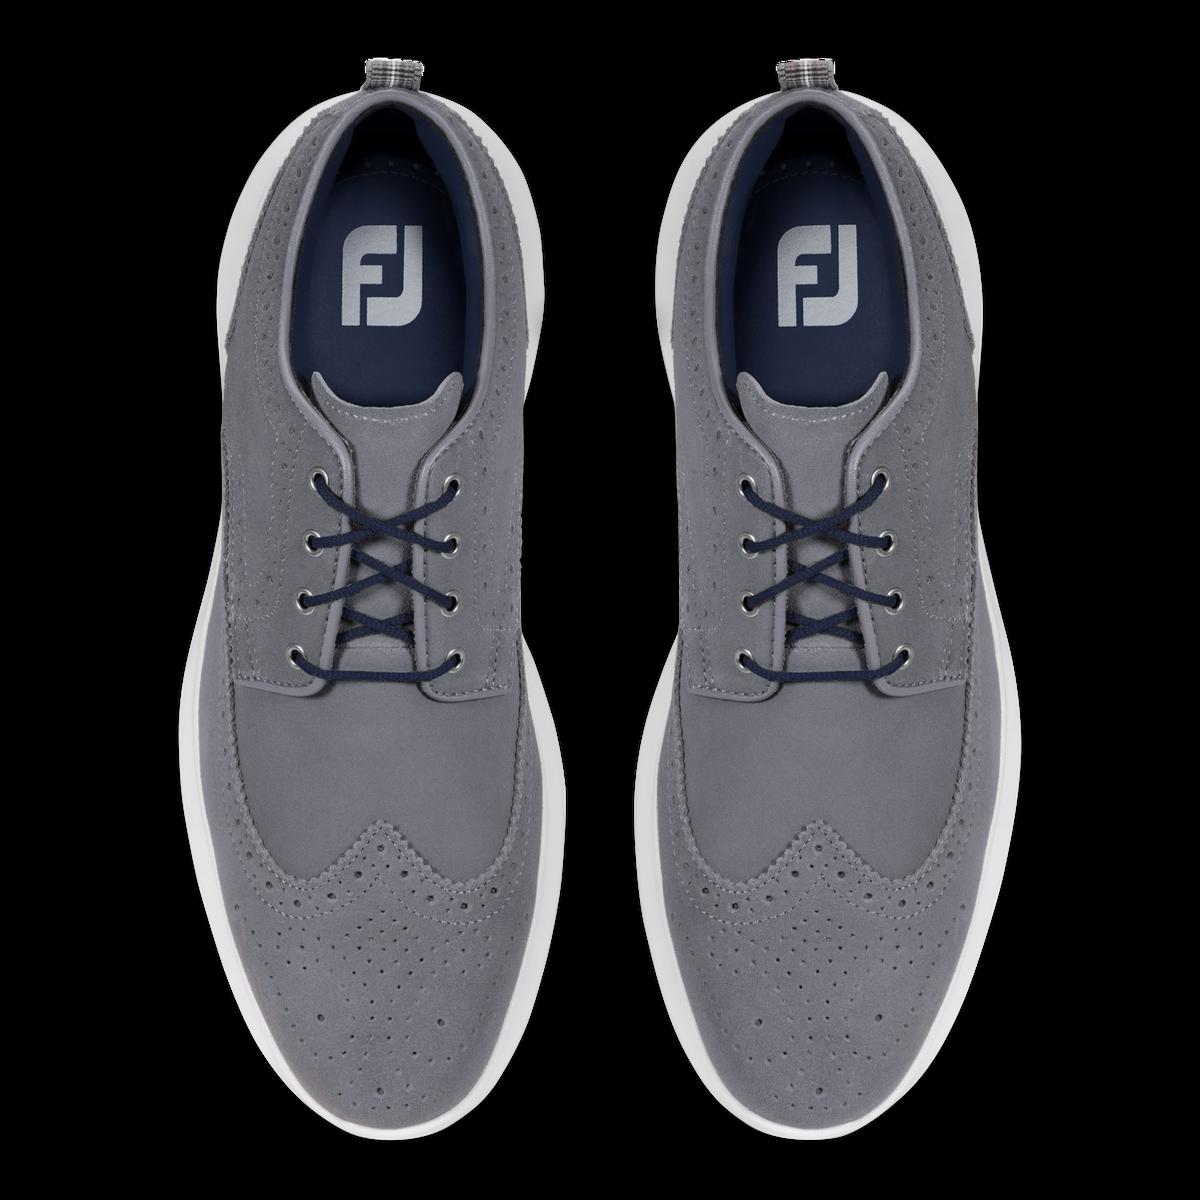 FJ Flex Limited Edition